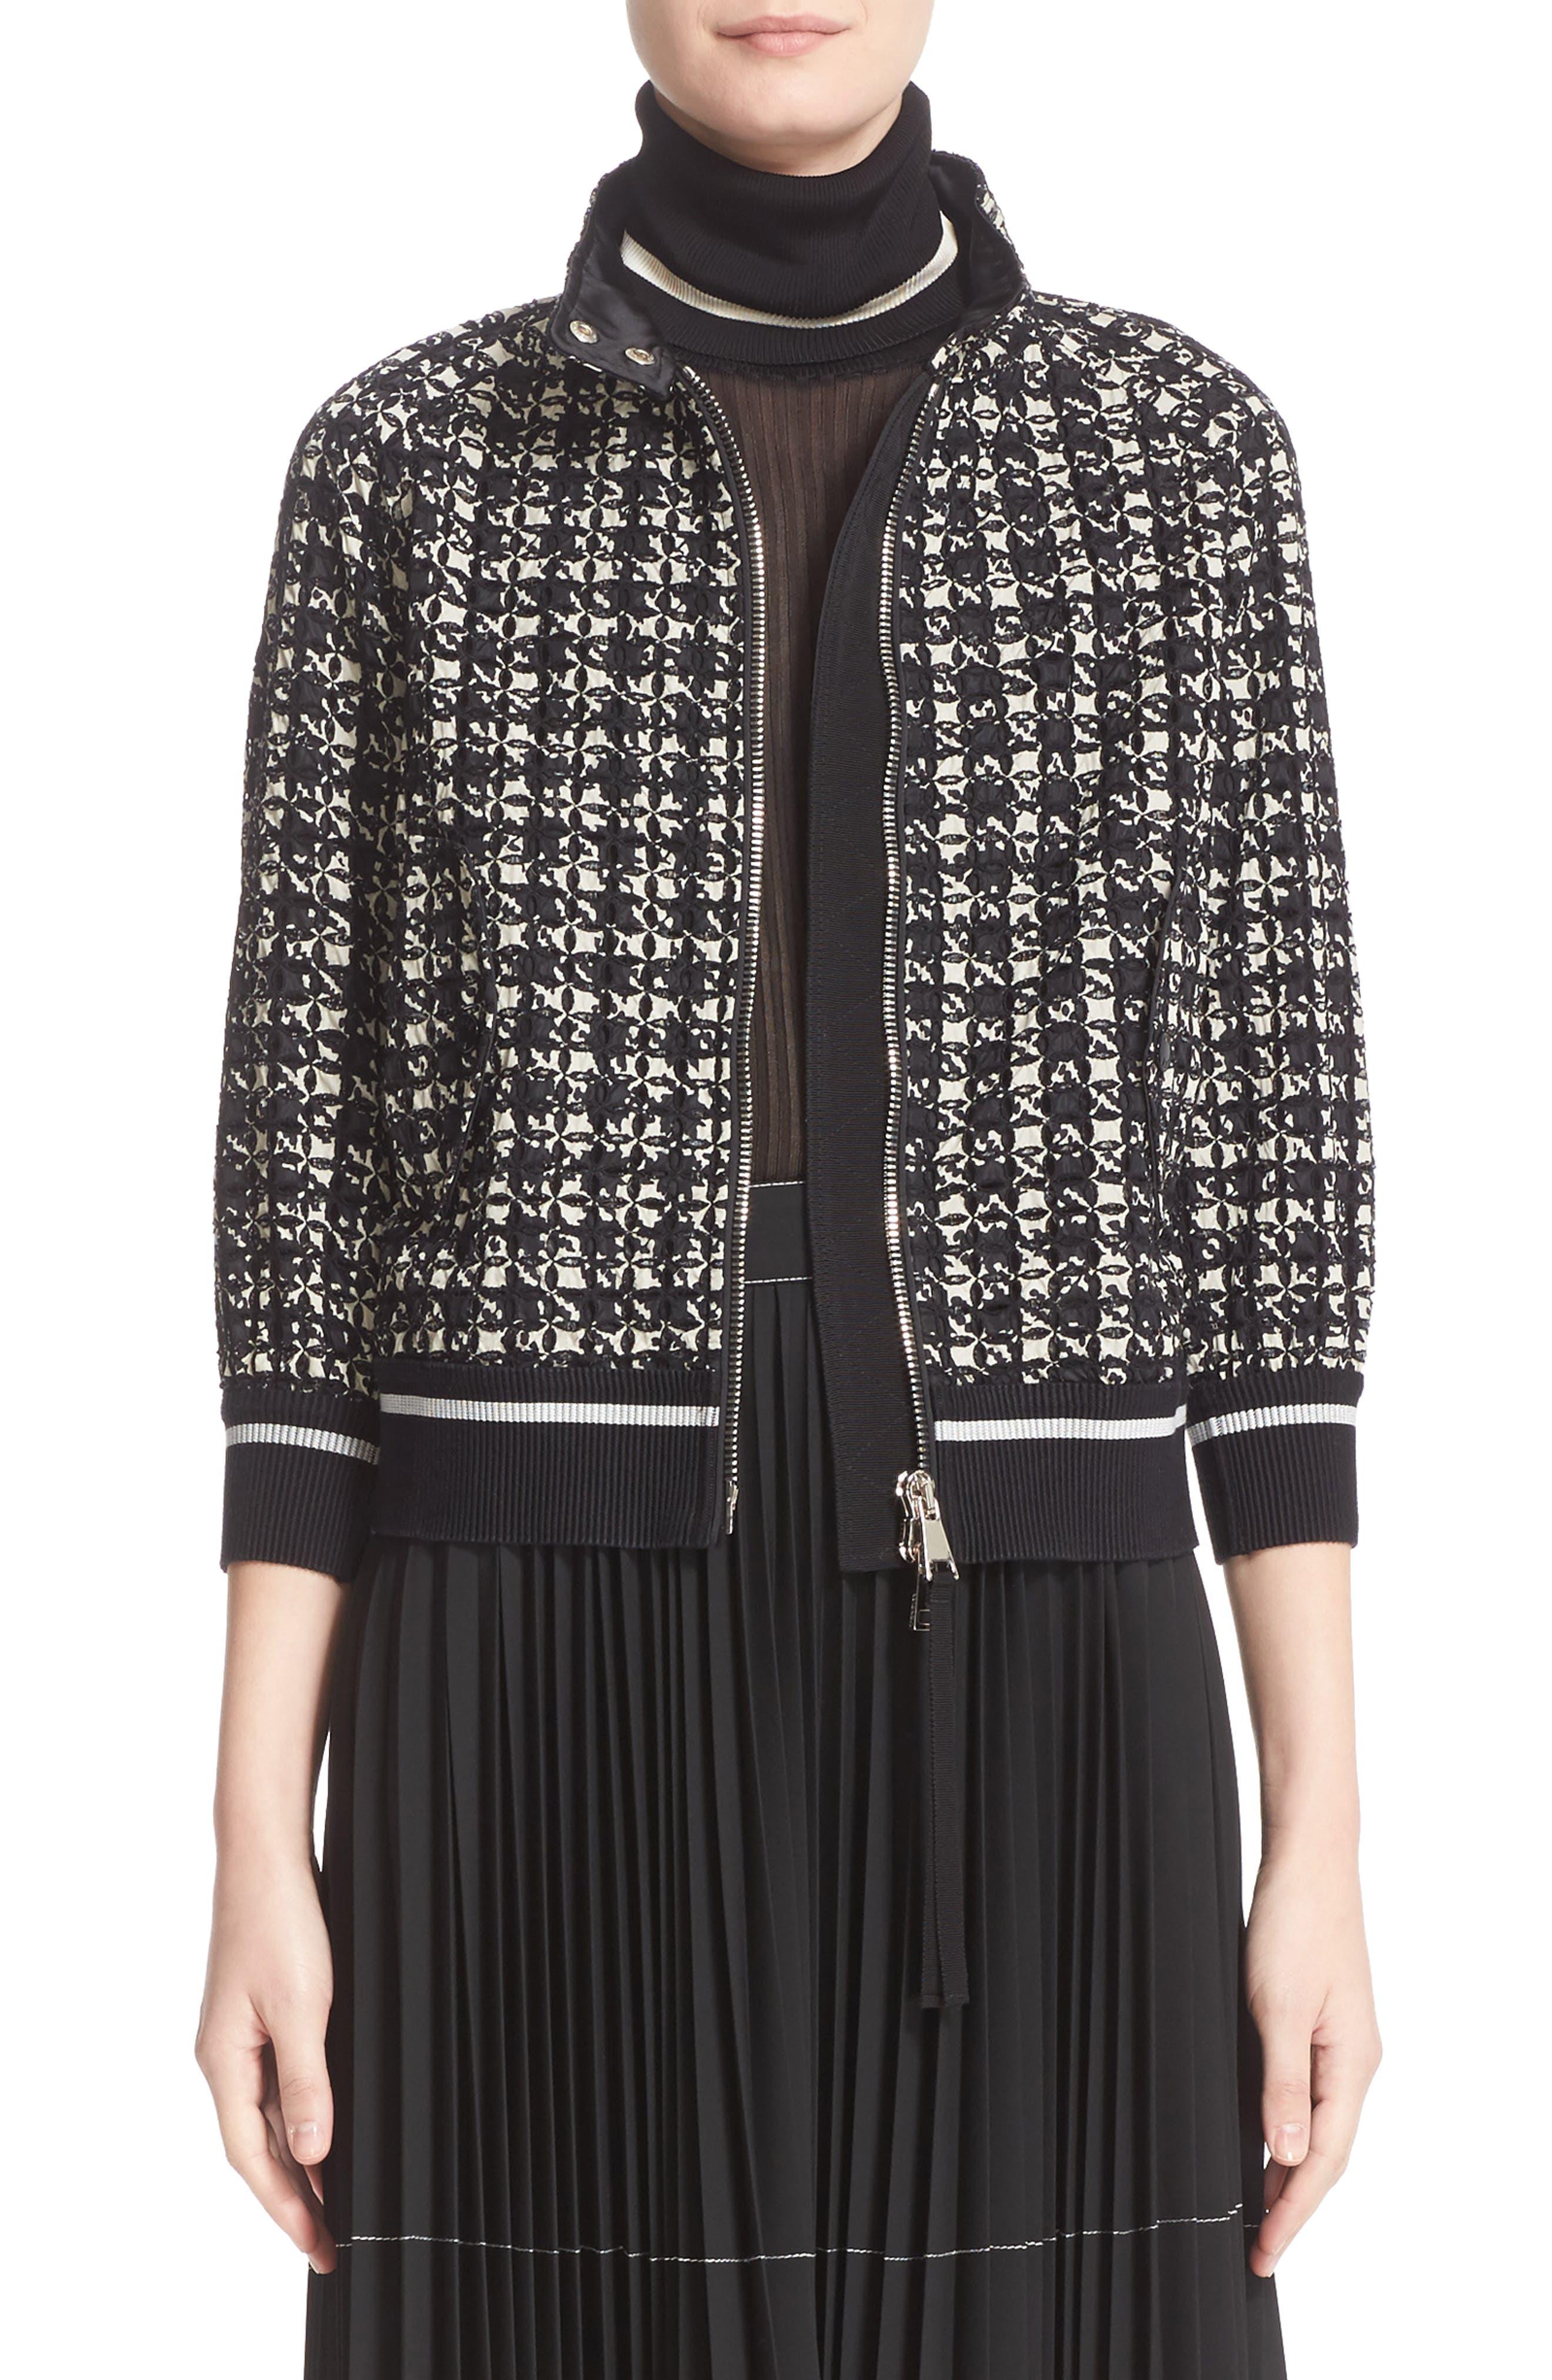 Fiadone Tweed Print Jacket,                             Main thumbnail 1, color,                             Black